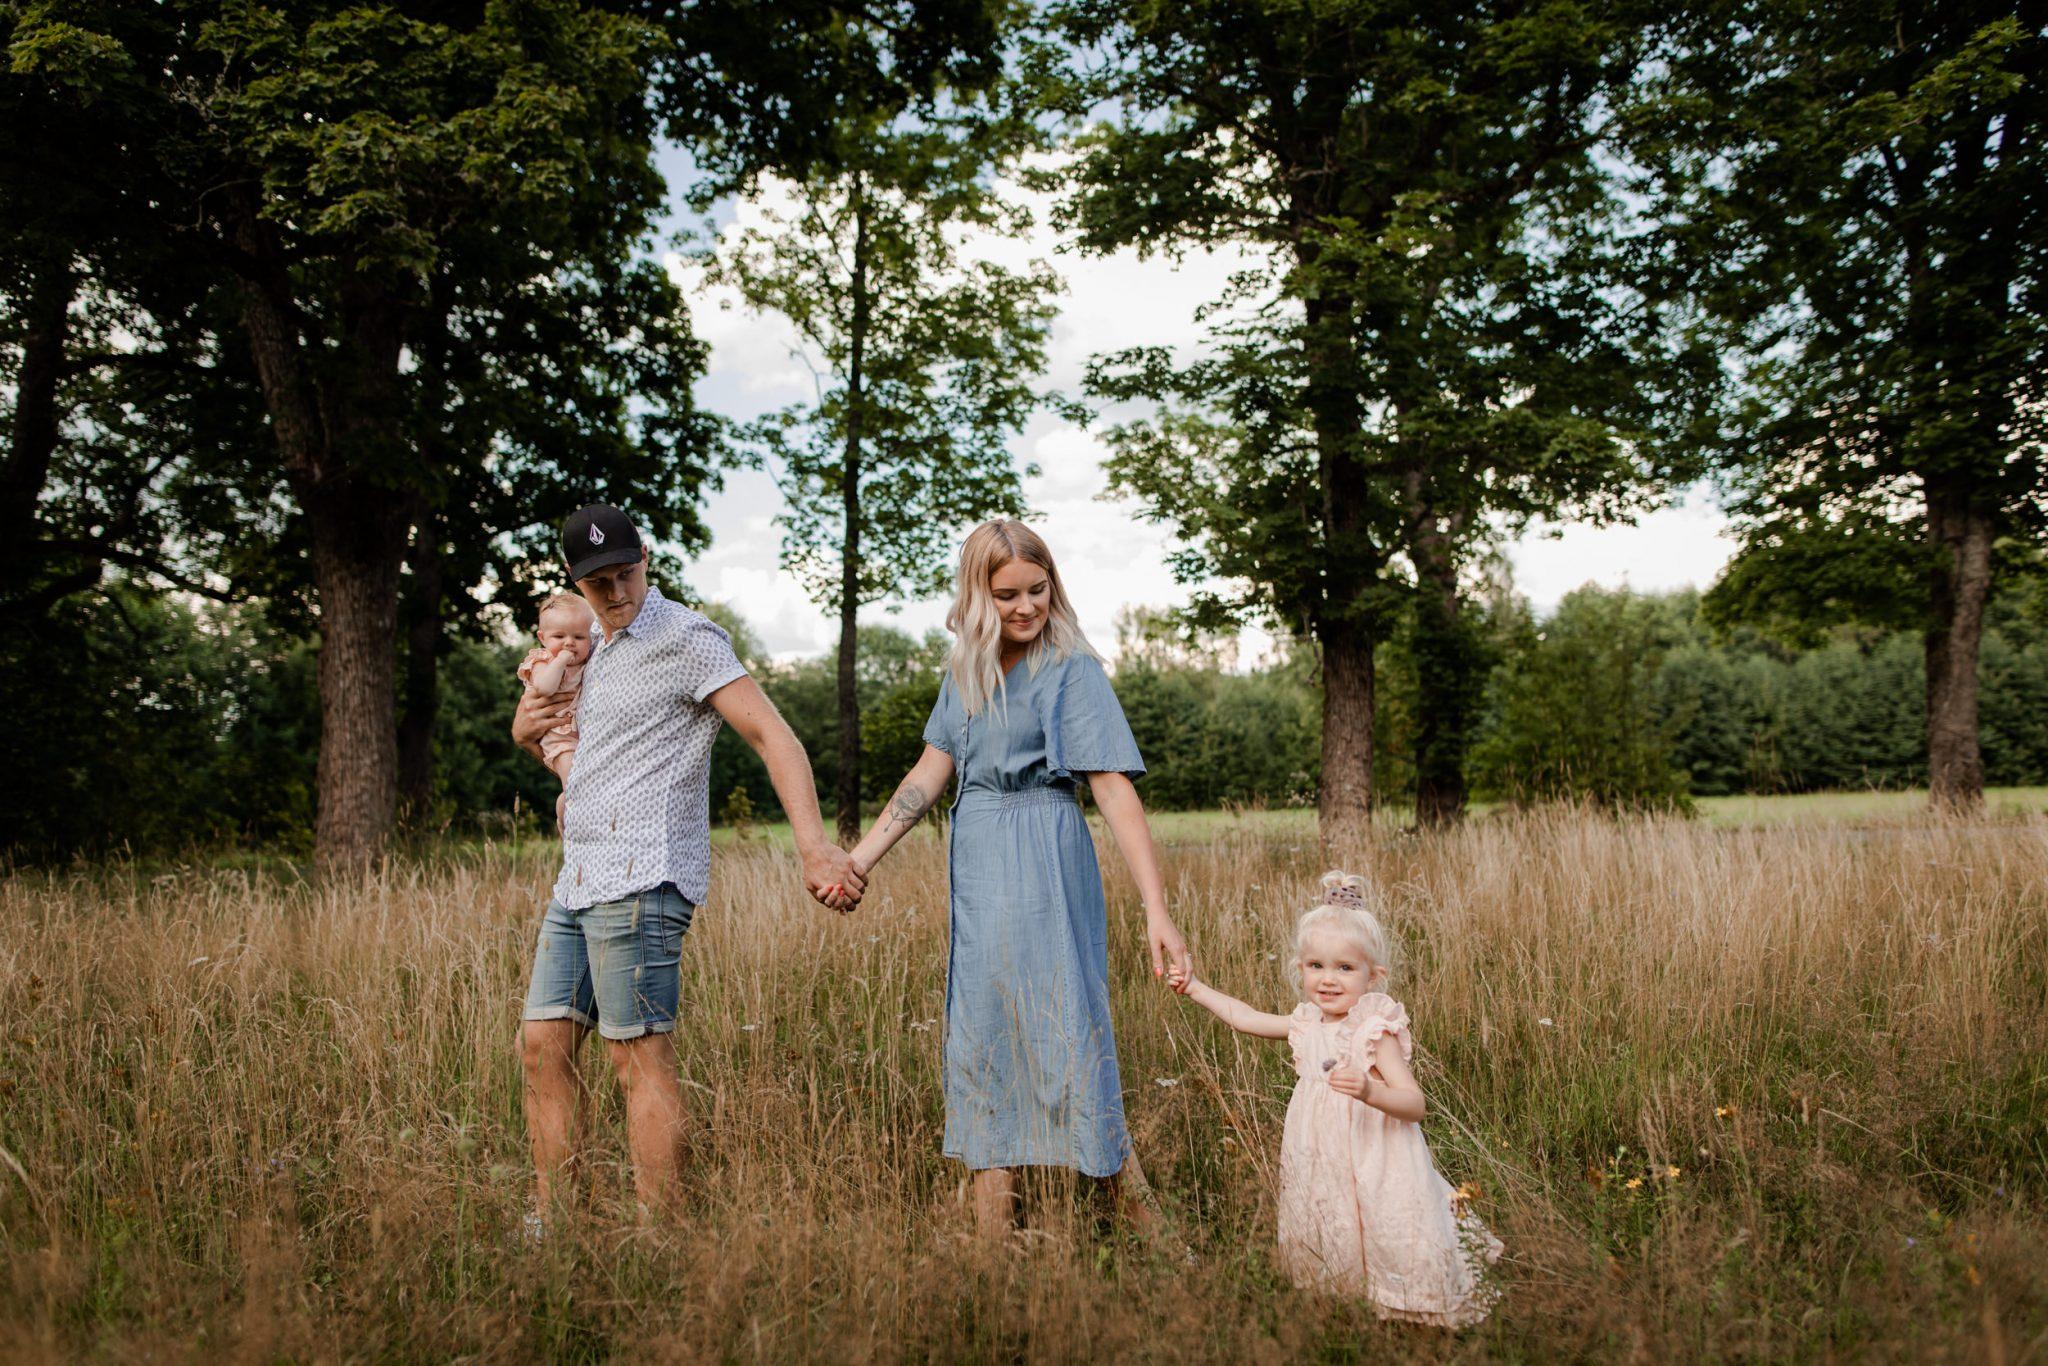 Familjefotografering i Eksjö